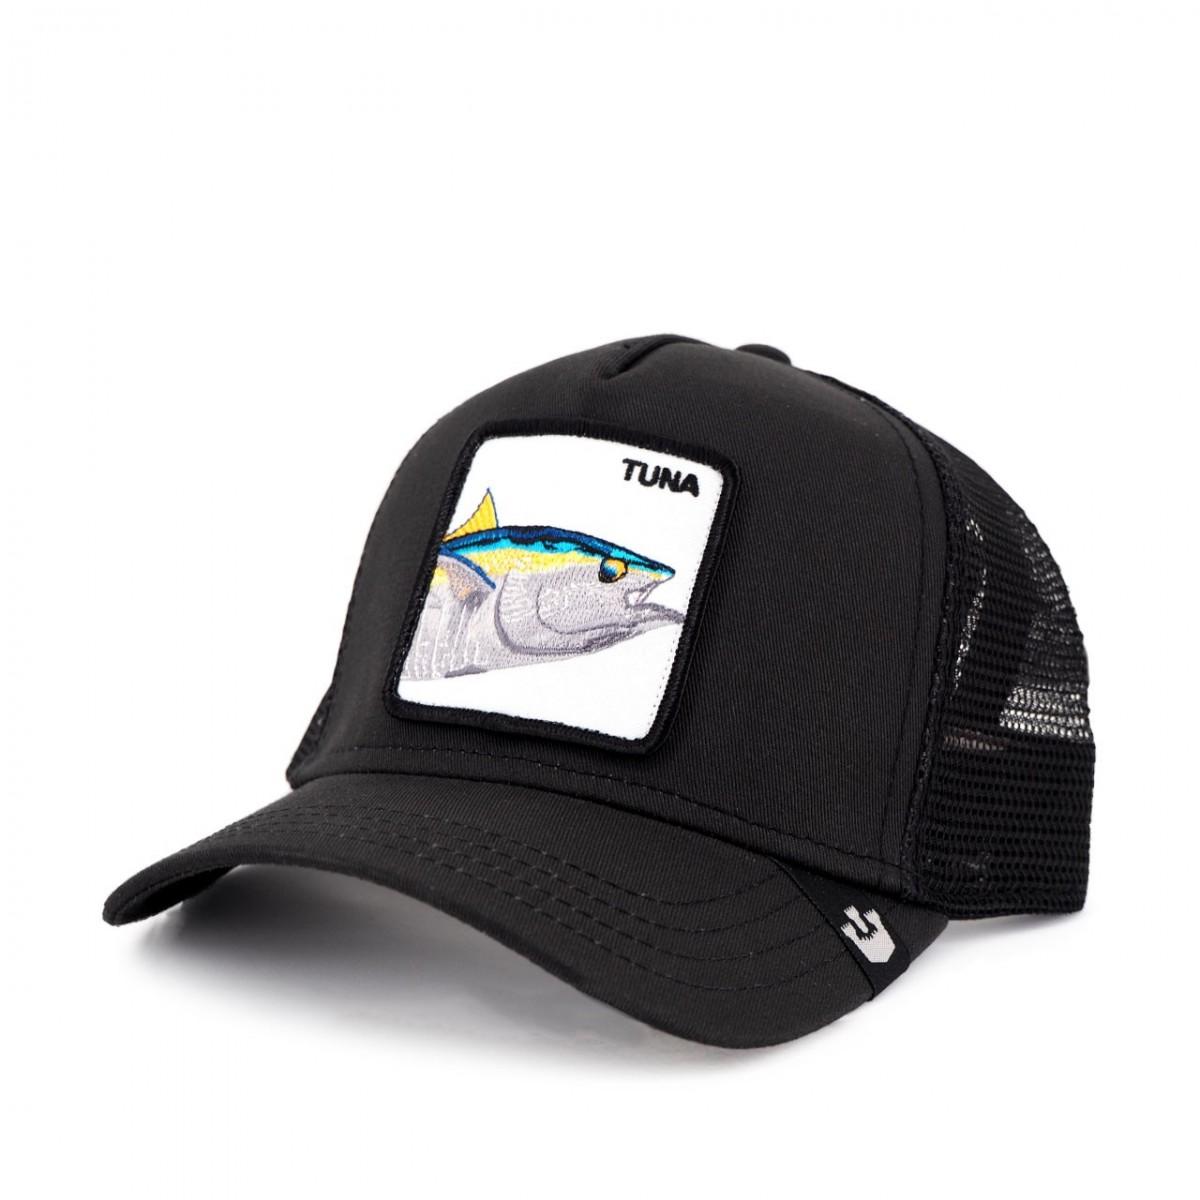 40fb980ed Goorin Bros. | Black Tuna Baseball Hat | GOB_101-0562-BLK